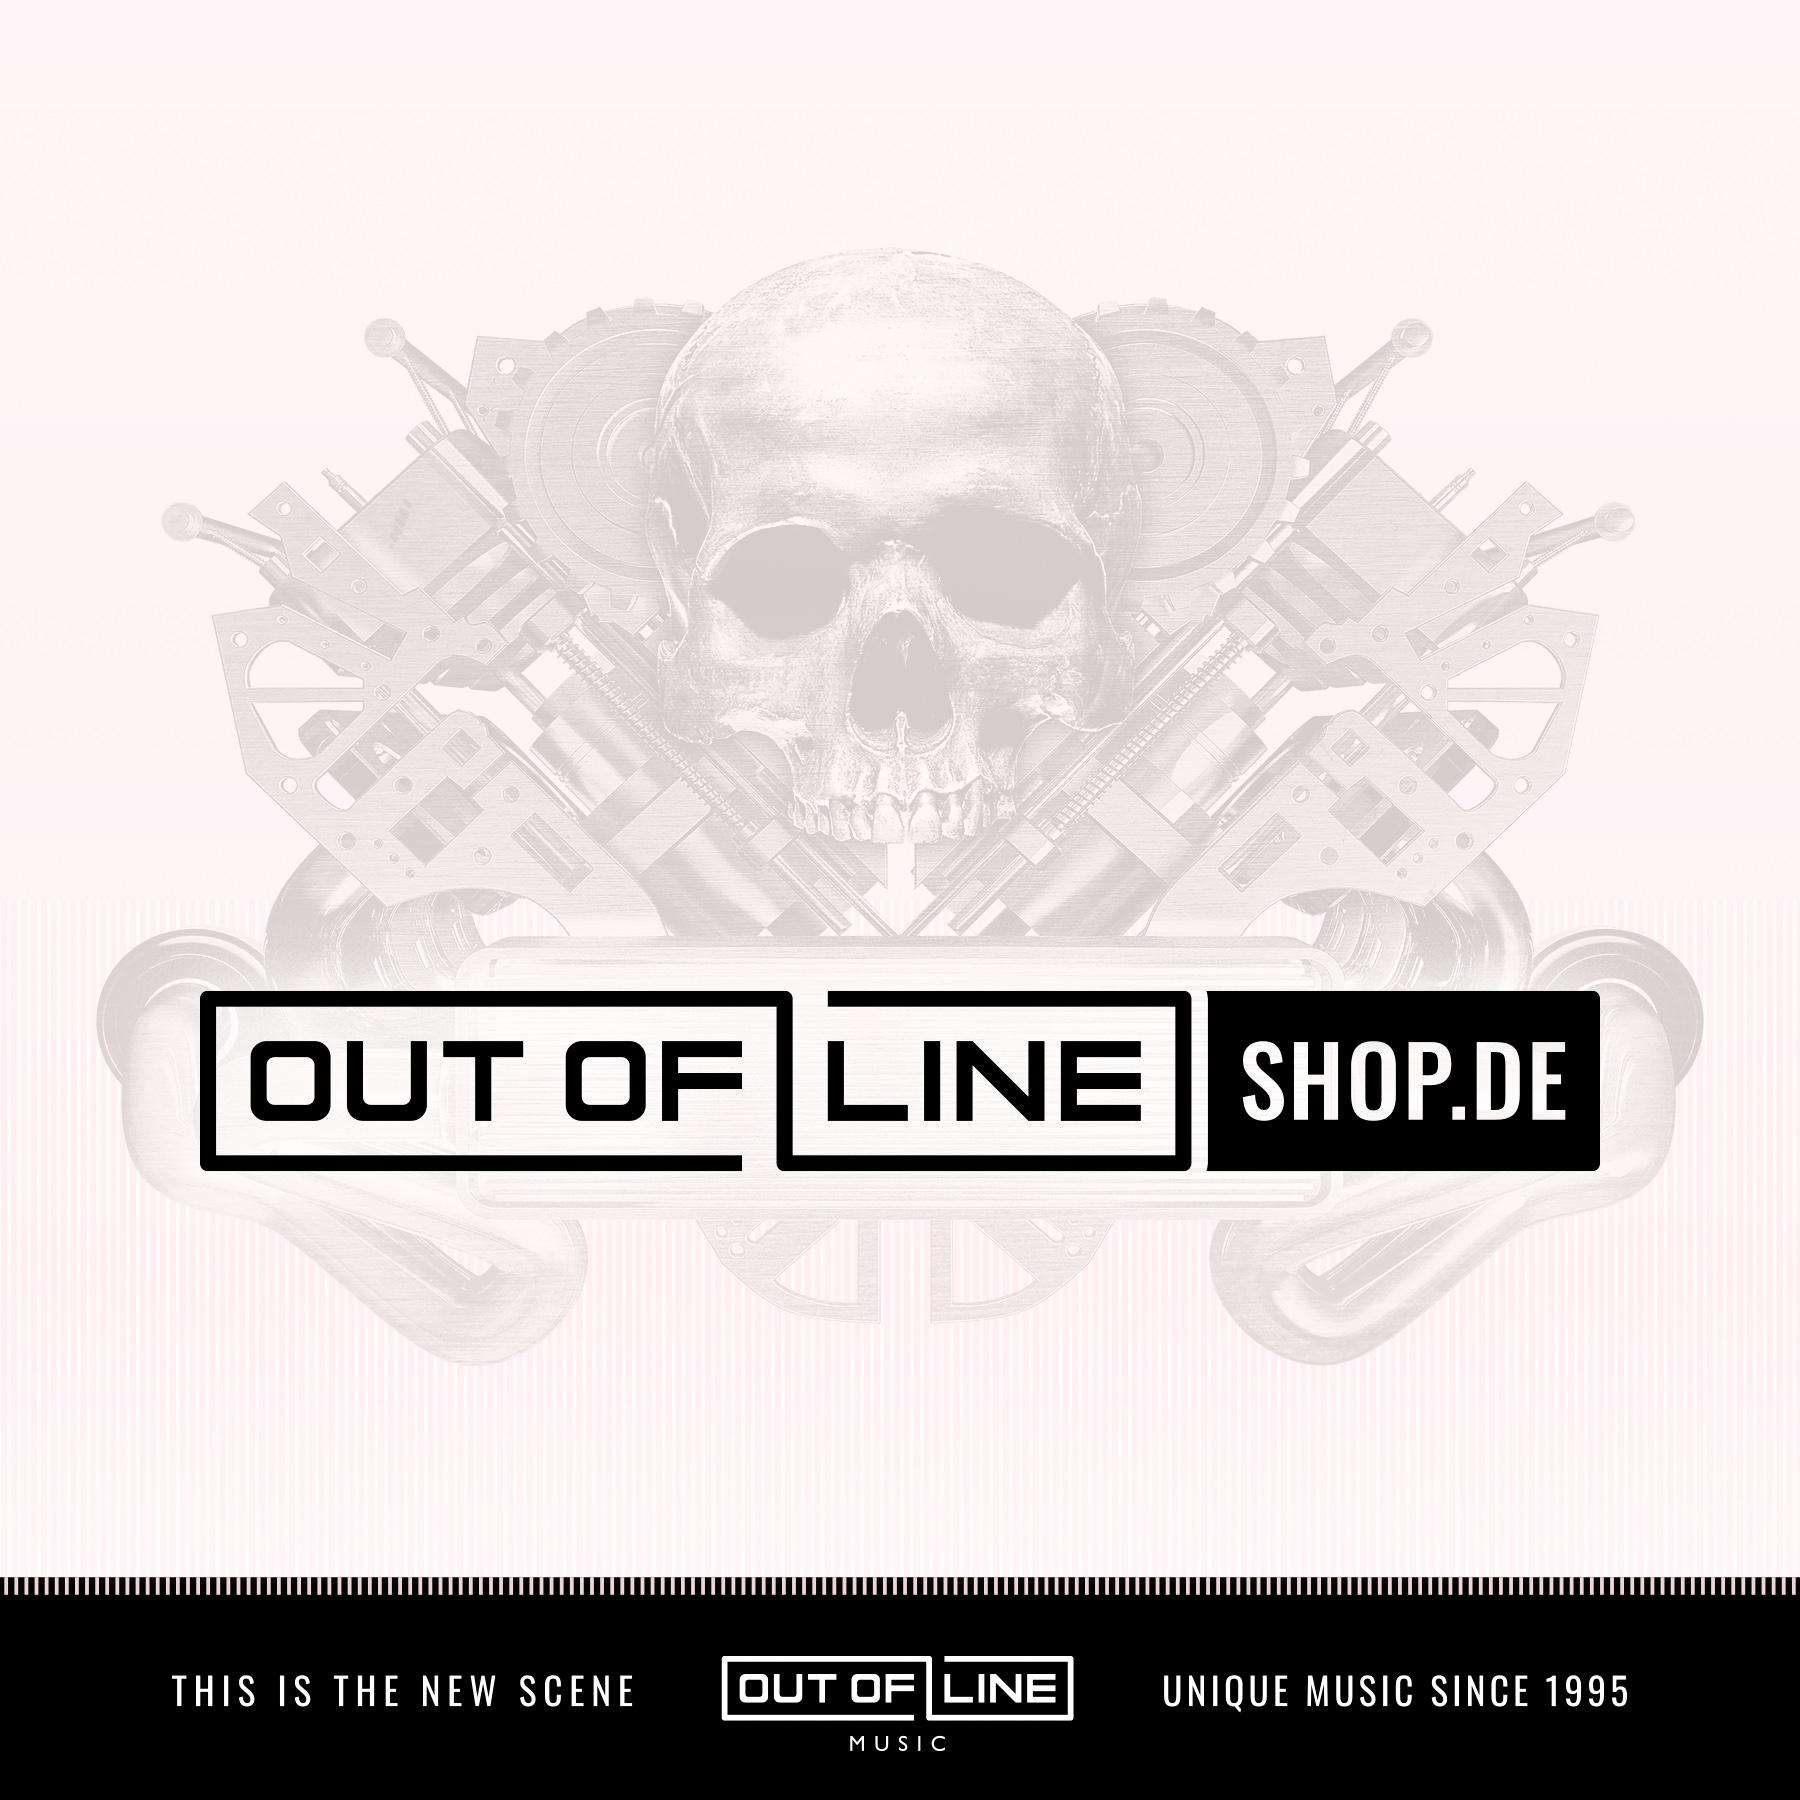 V.A. - Dependence 2013 - CD